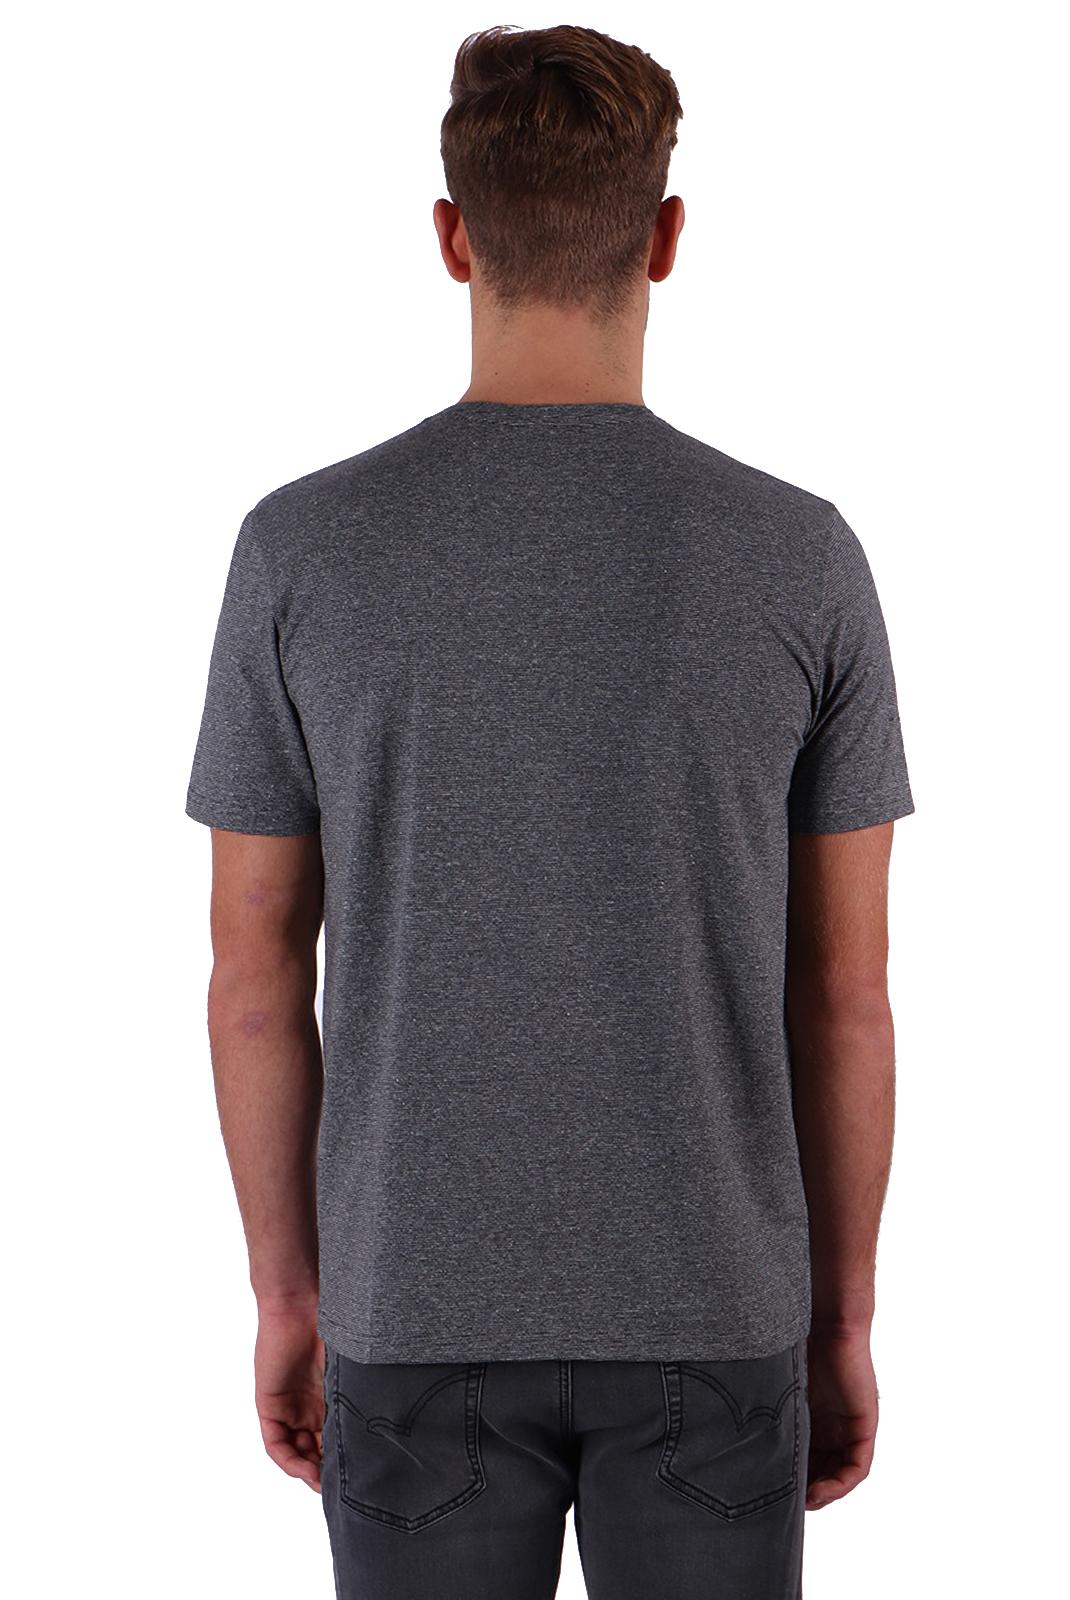 Tee-shirts  Kaporal MOLIA MEDIUM GREY MELANGE